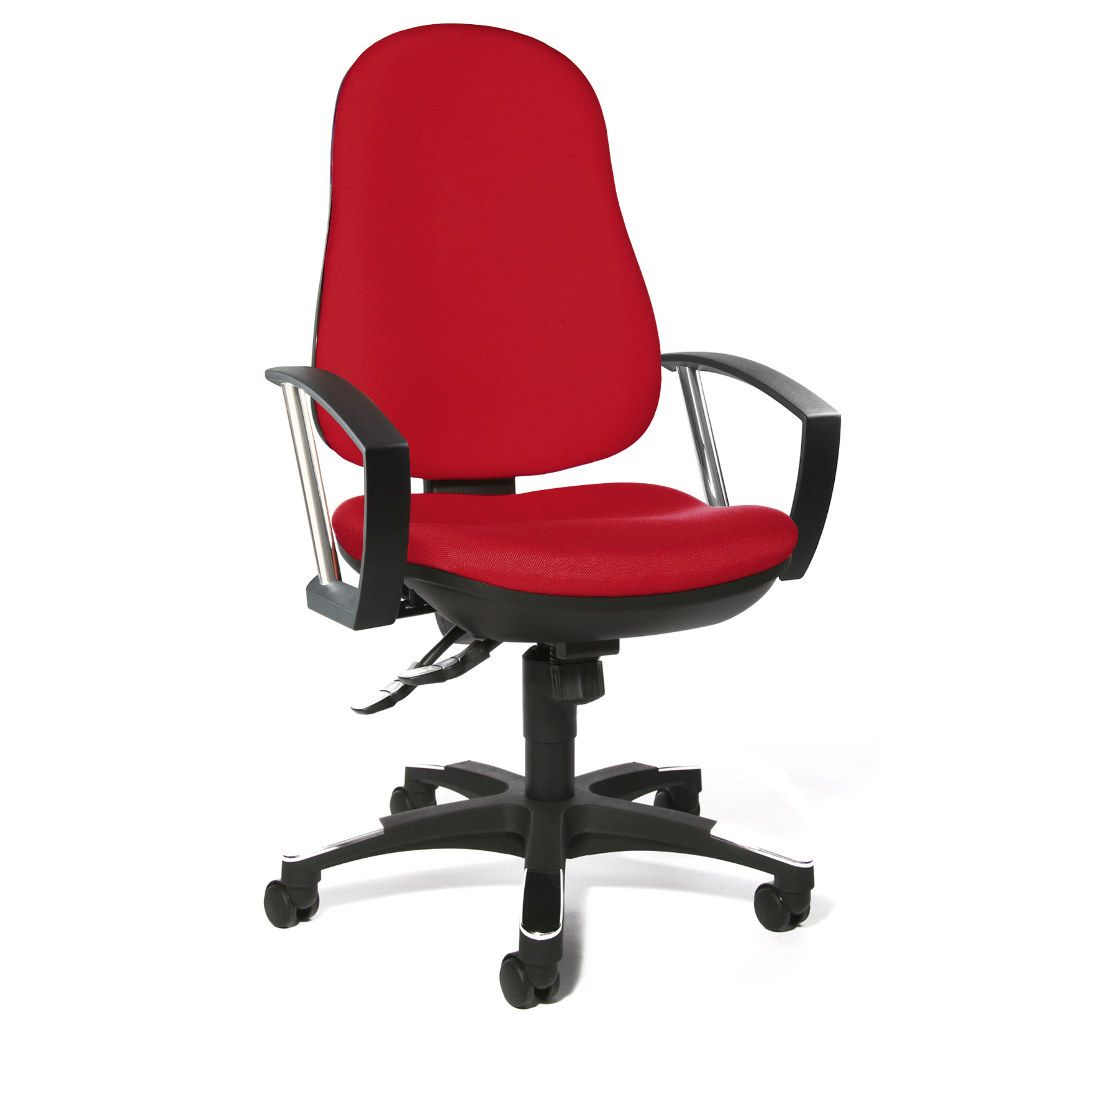 home24 Trend 10 Drehstuhl | Büro > Bürostühle und Sessel  > Bürostühle | Rot | Topstar